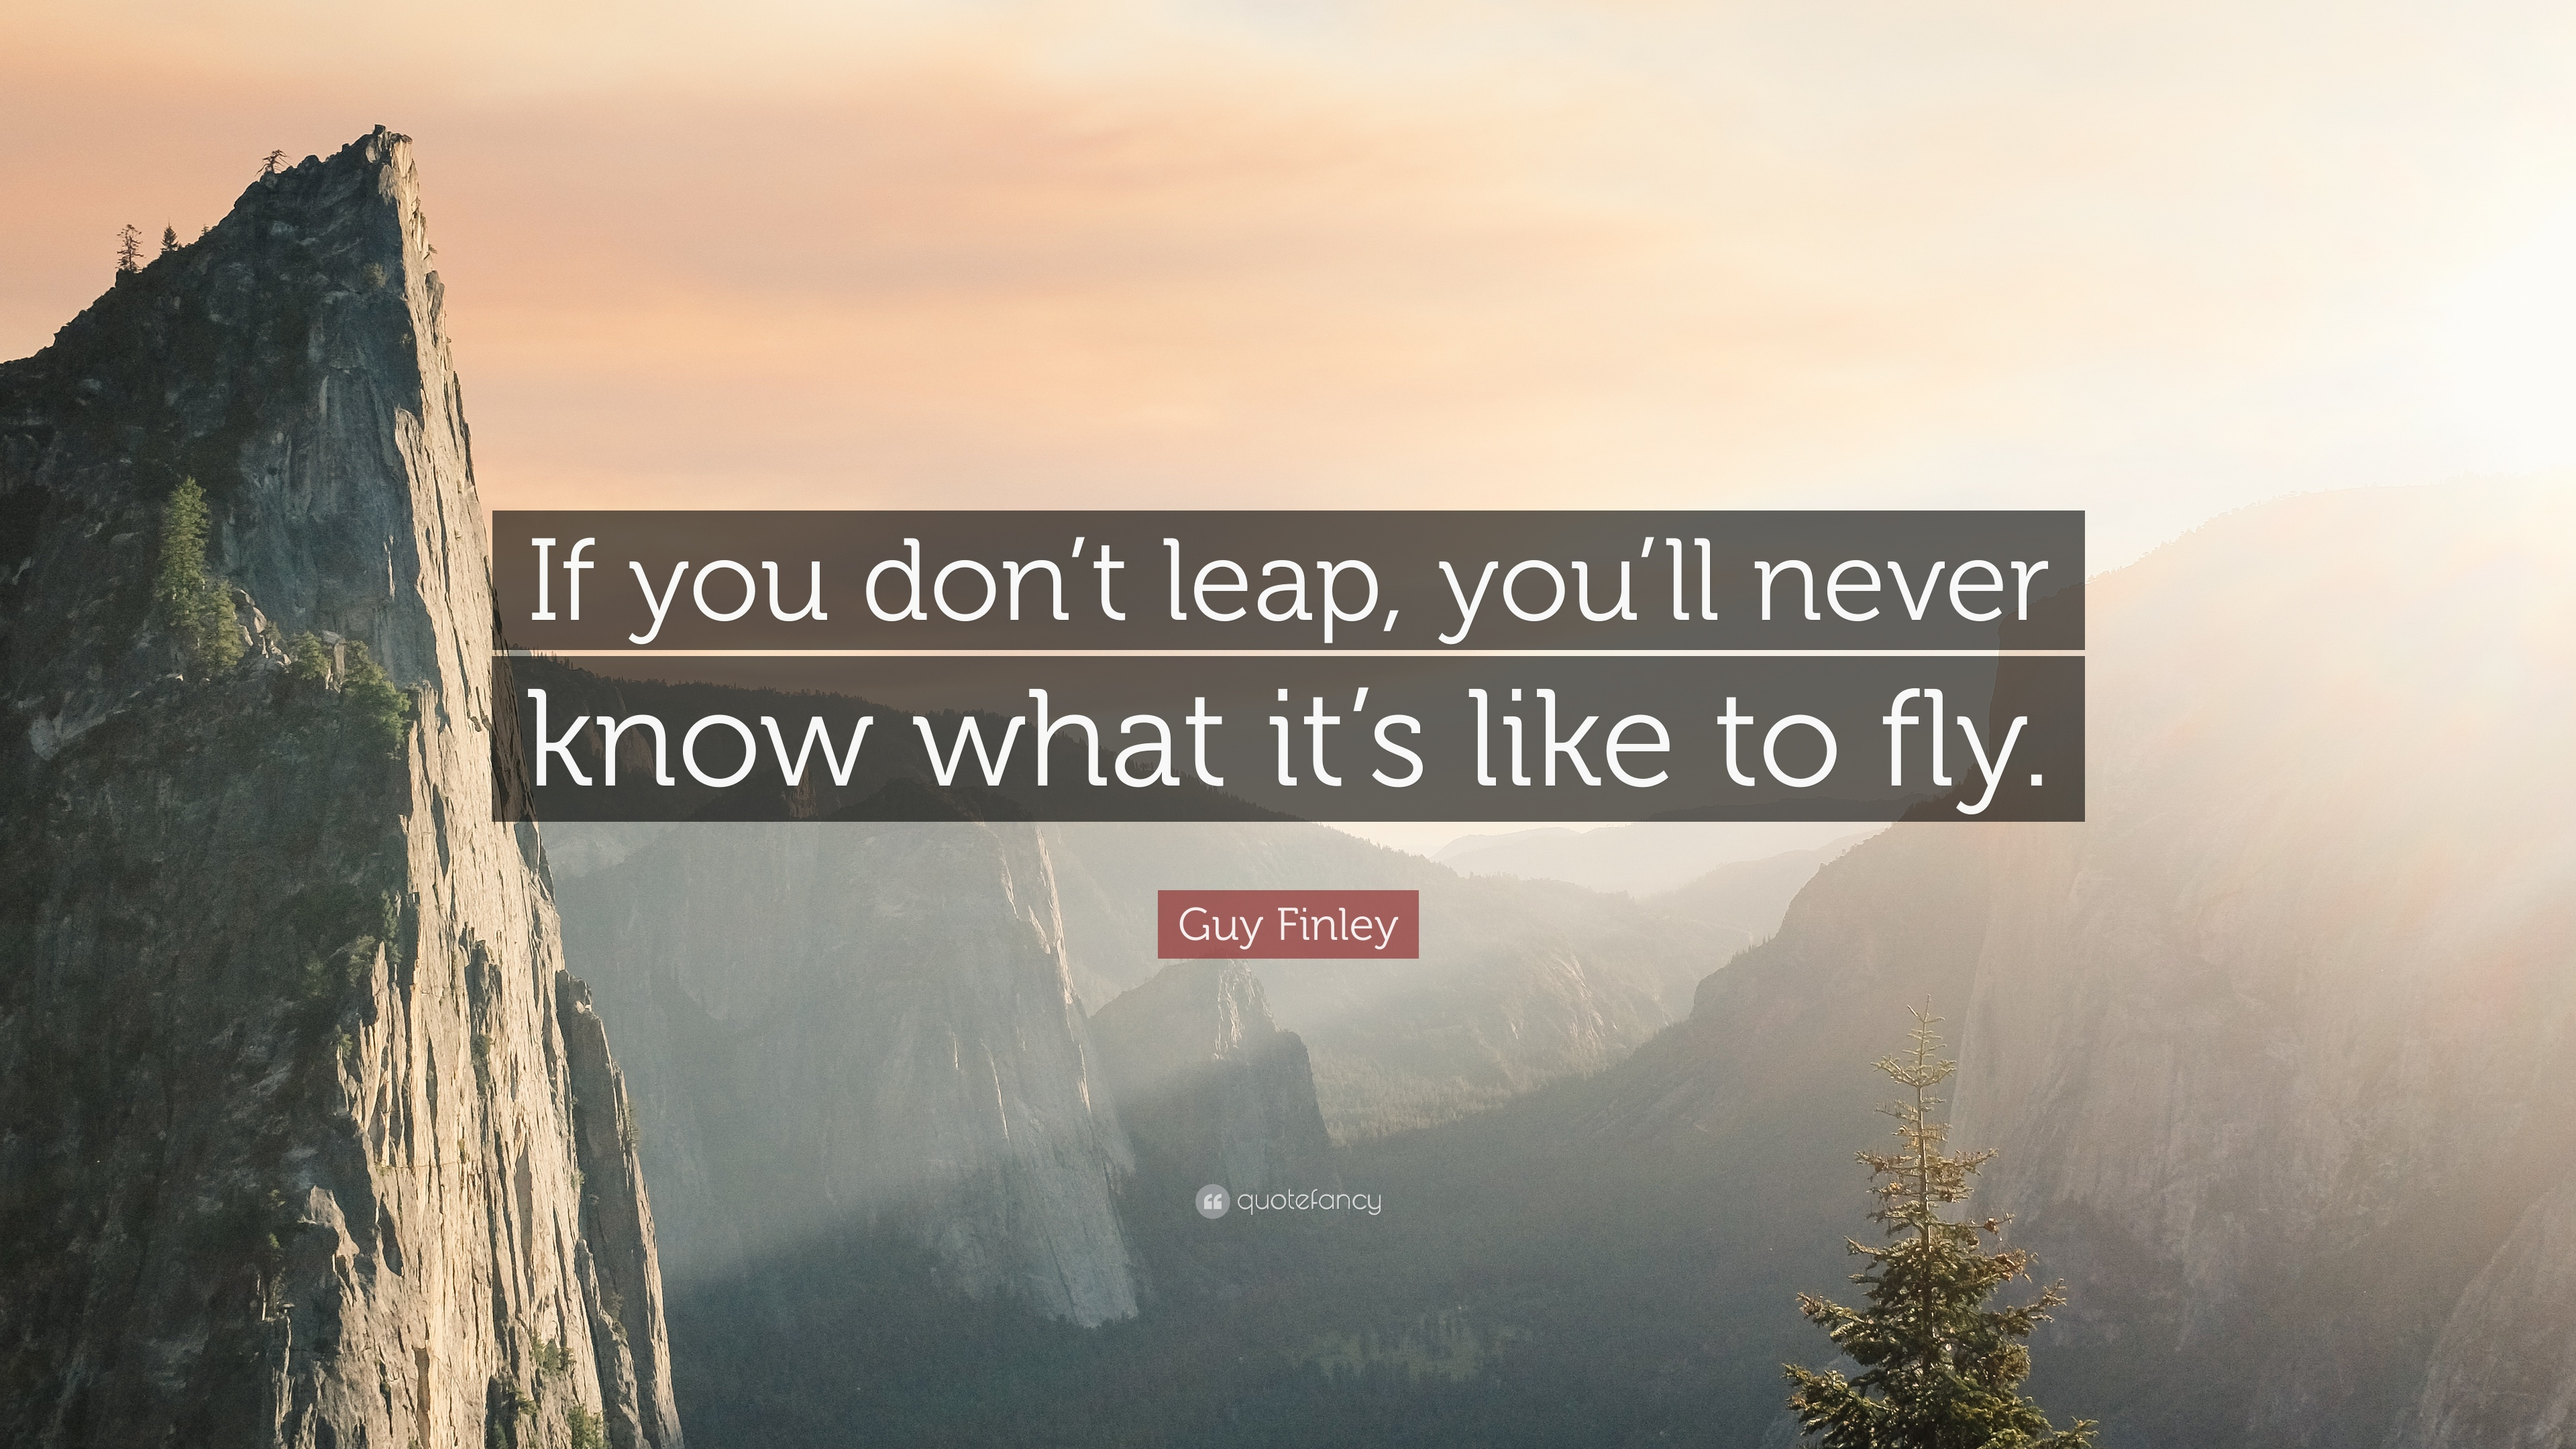 Guy Finley Quote If You Don T Leap You Ll Never Know What It S Like To Fly 9 Wallpapers Quotefancy Bạn có thể click vào đây để đăng lời cho bài hát này. guy finley quote if you don t leap